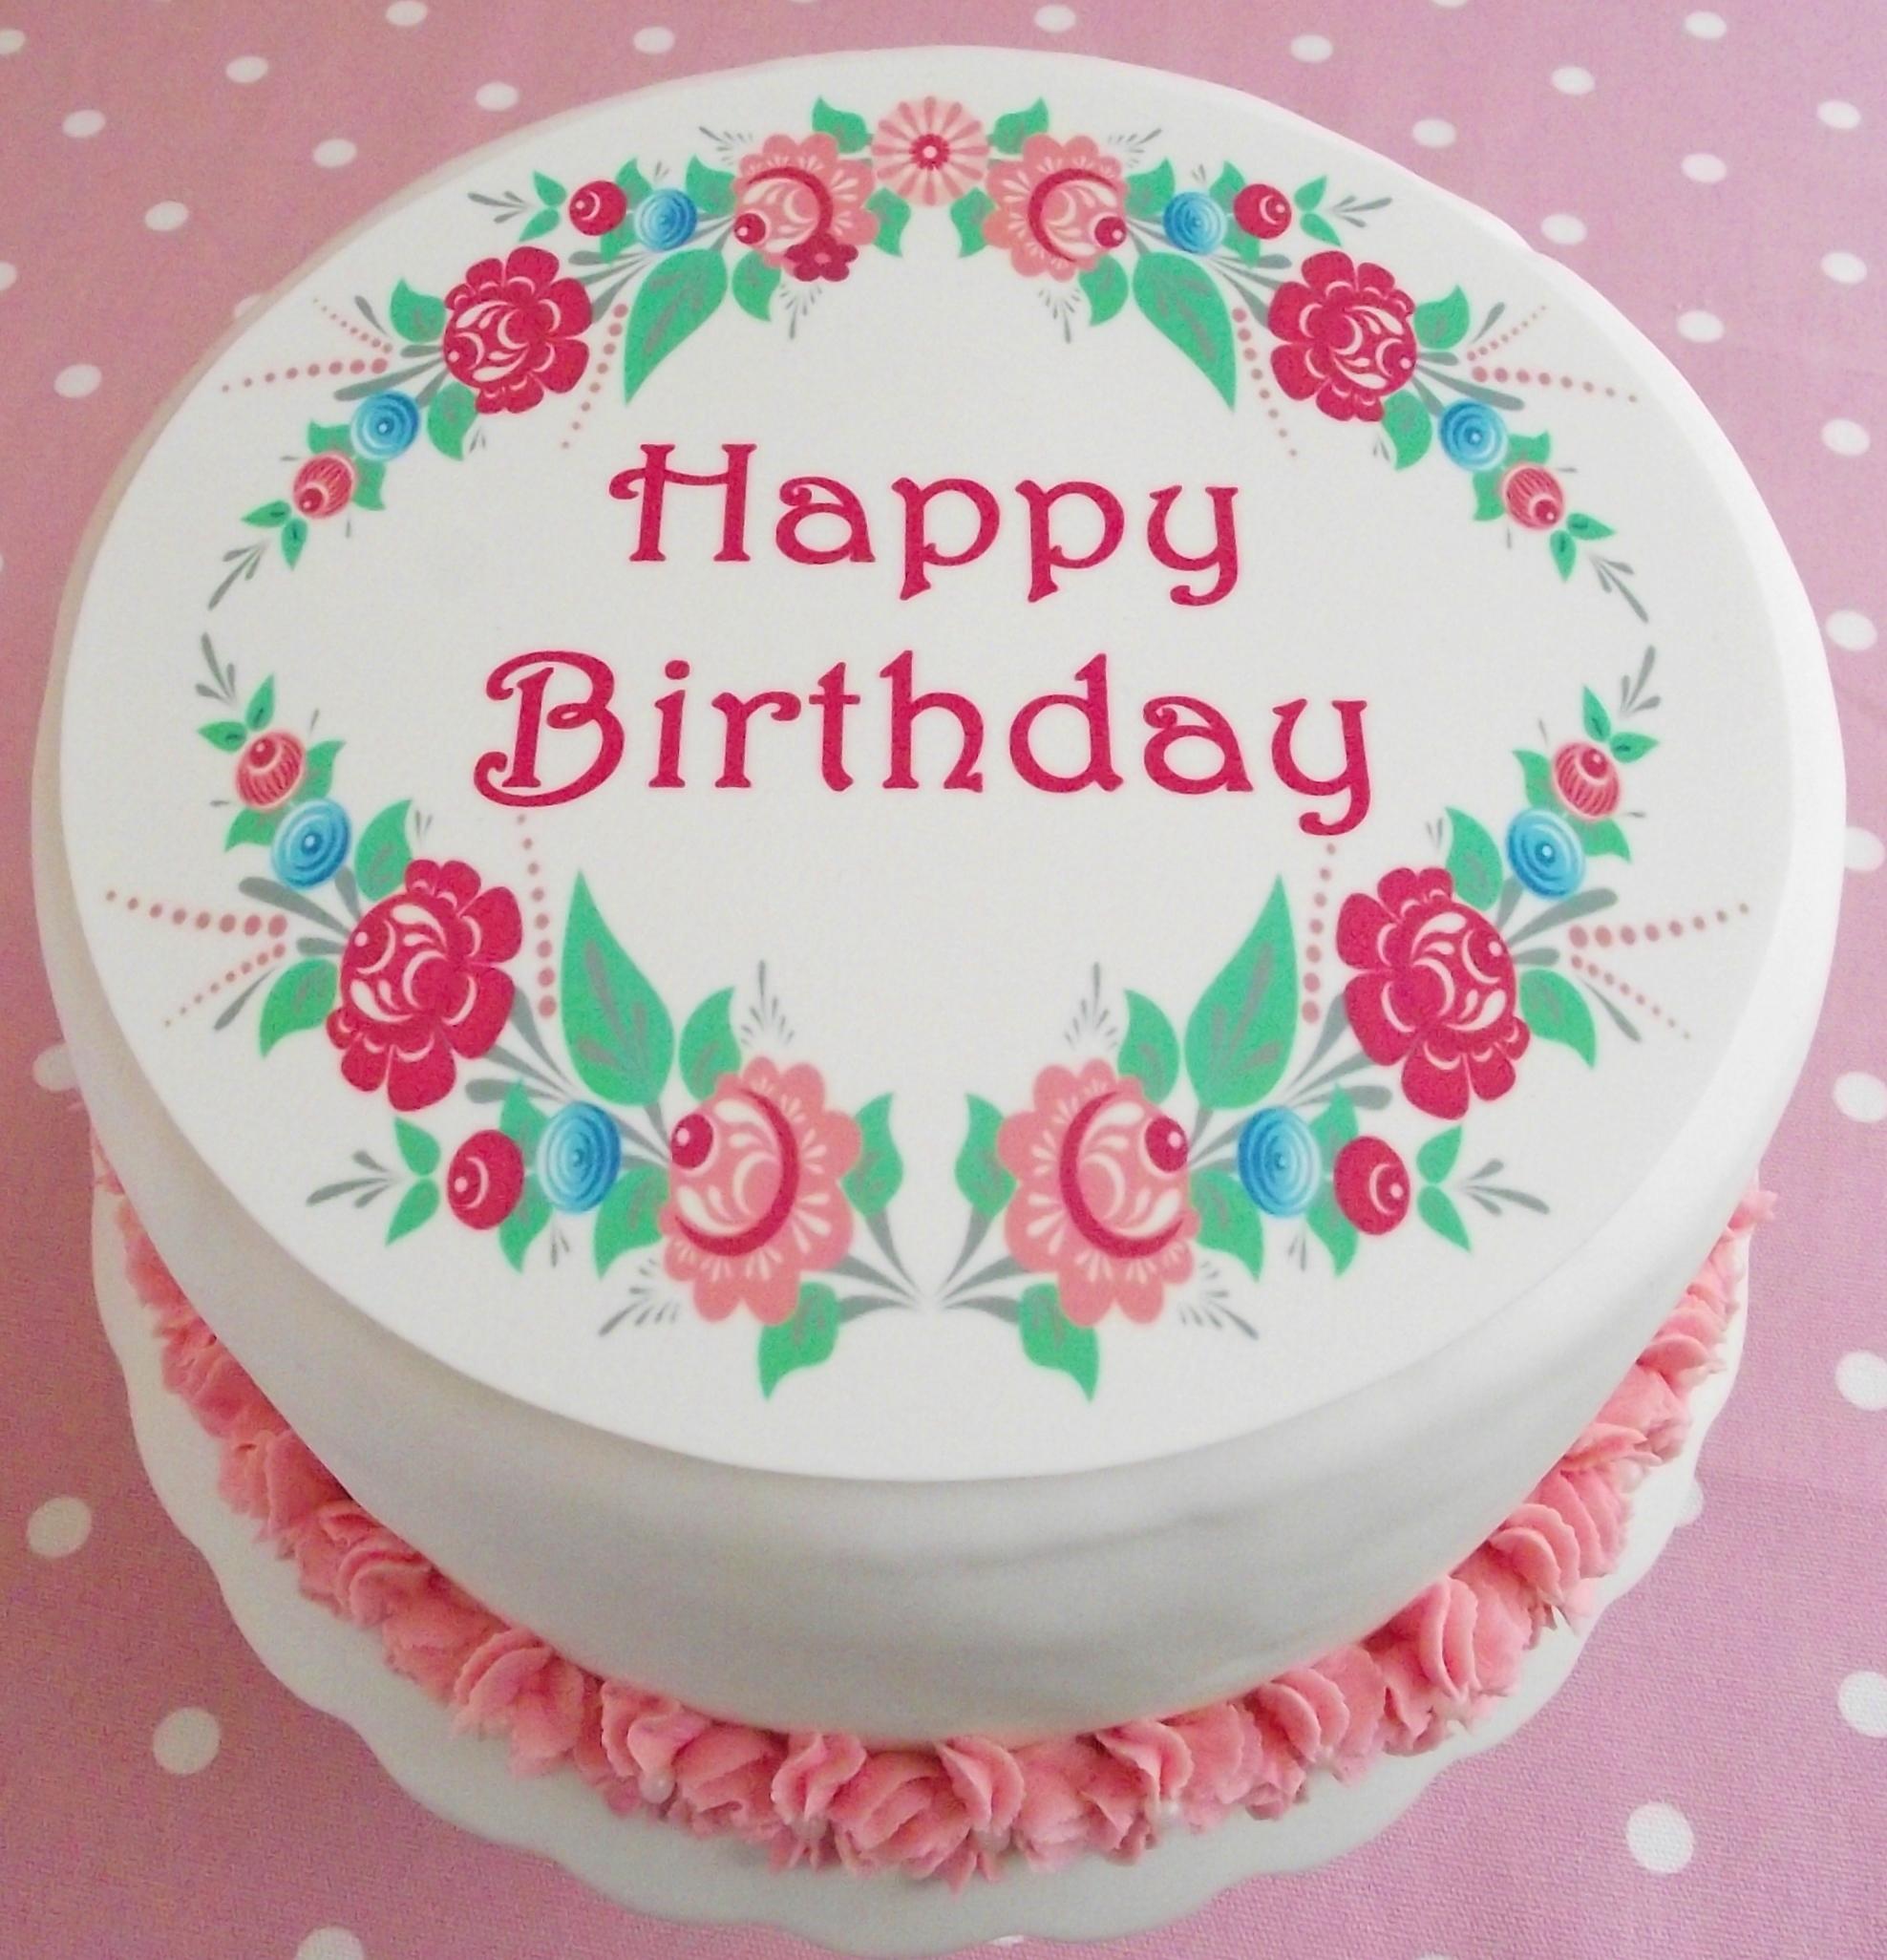 Happy Birthday Cake Wallpaper Wallpapersafari